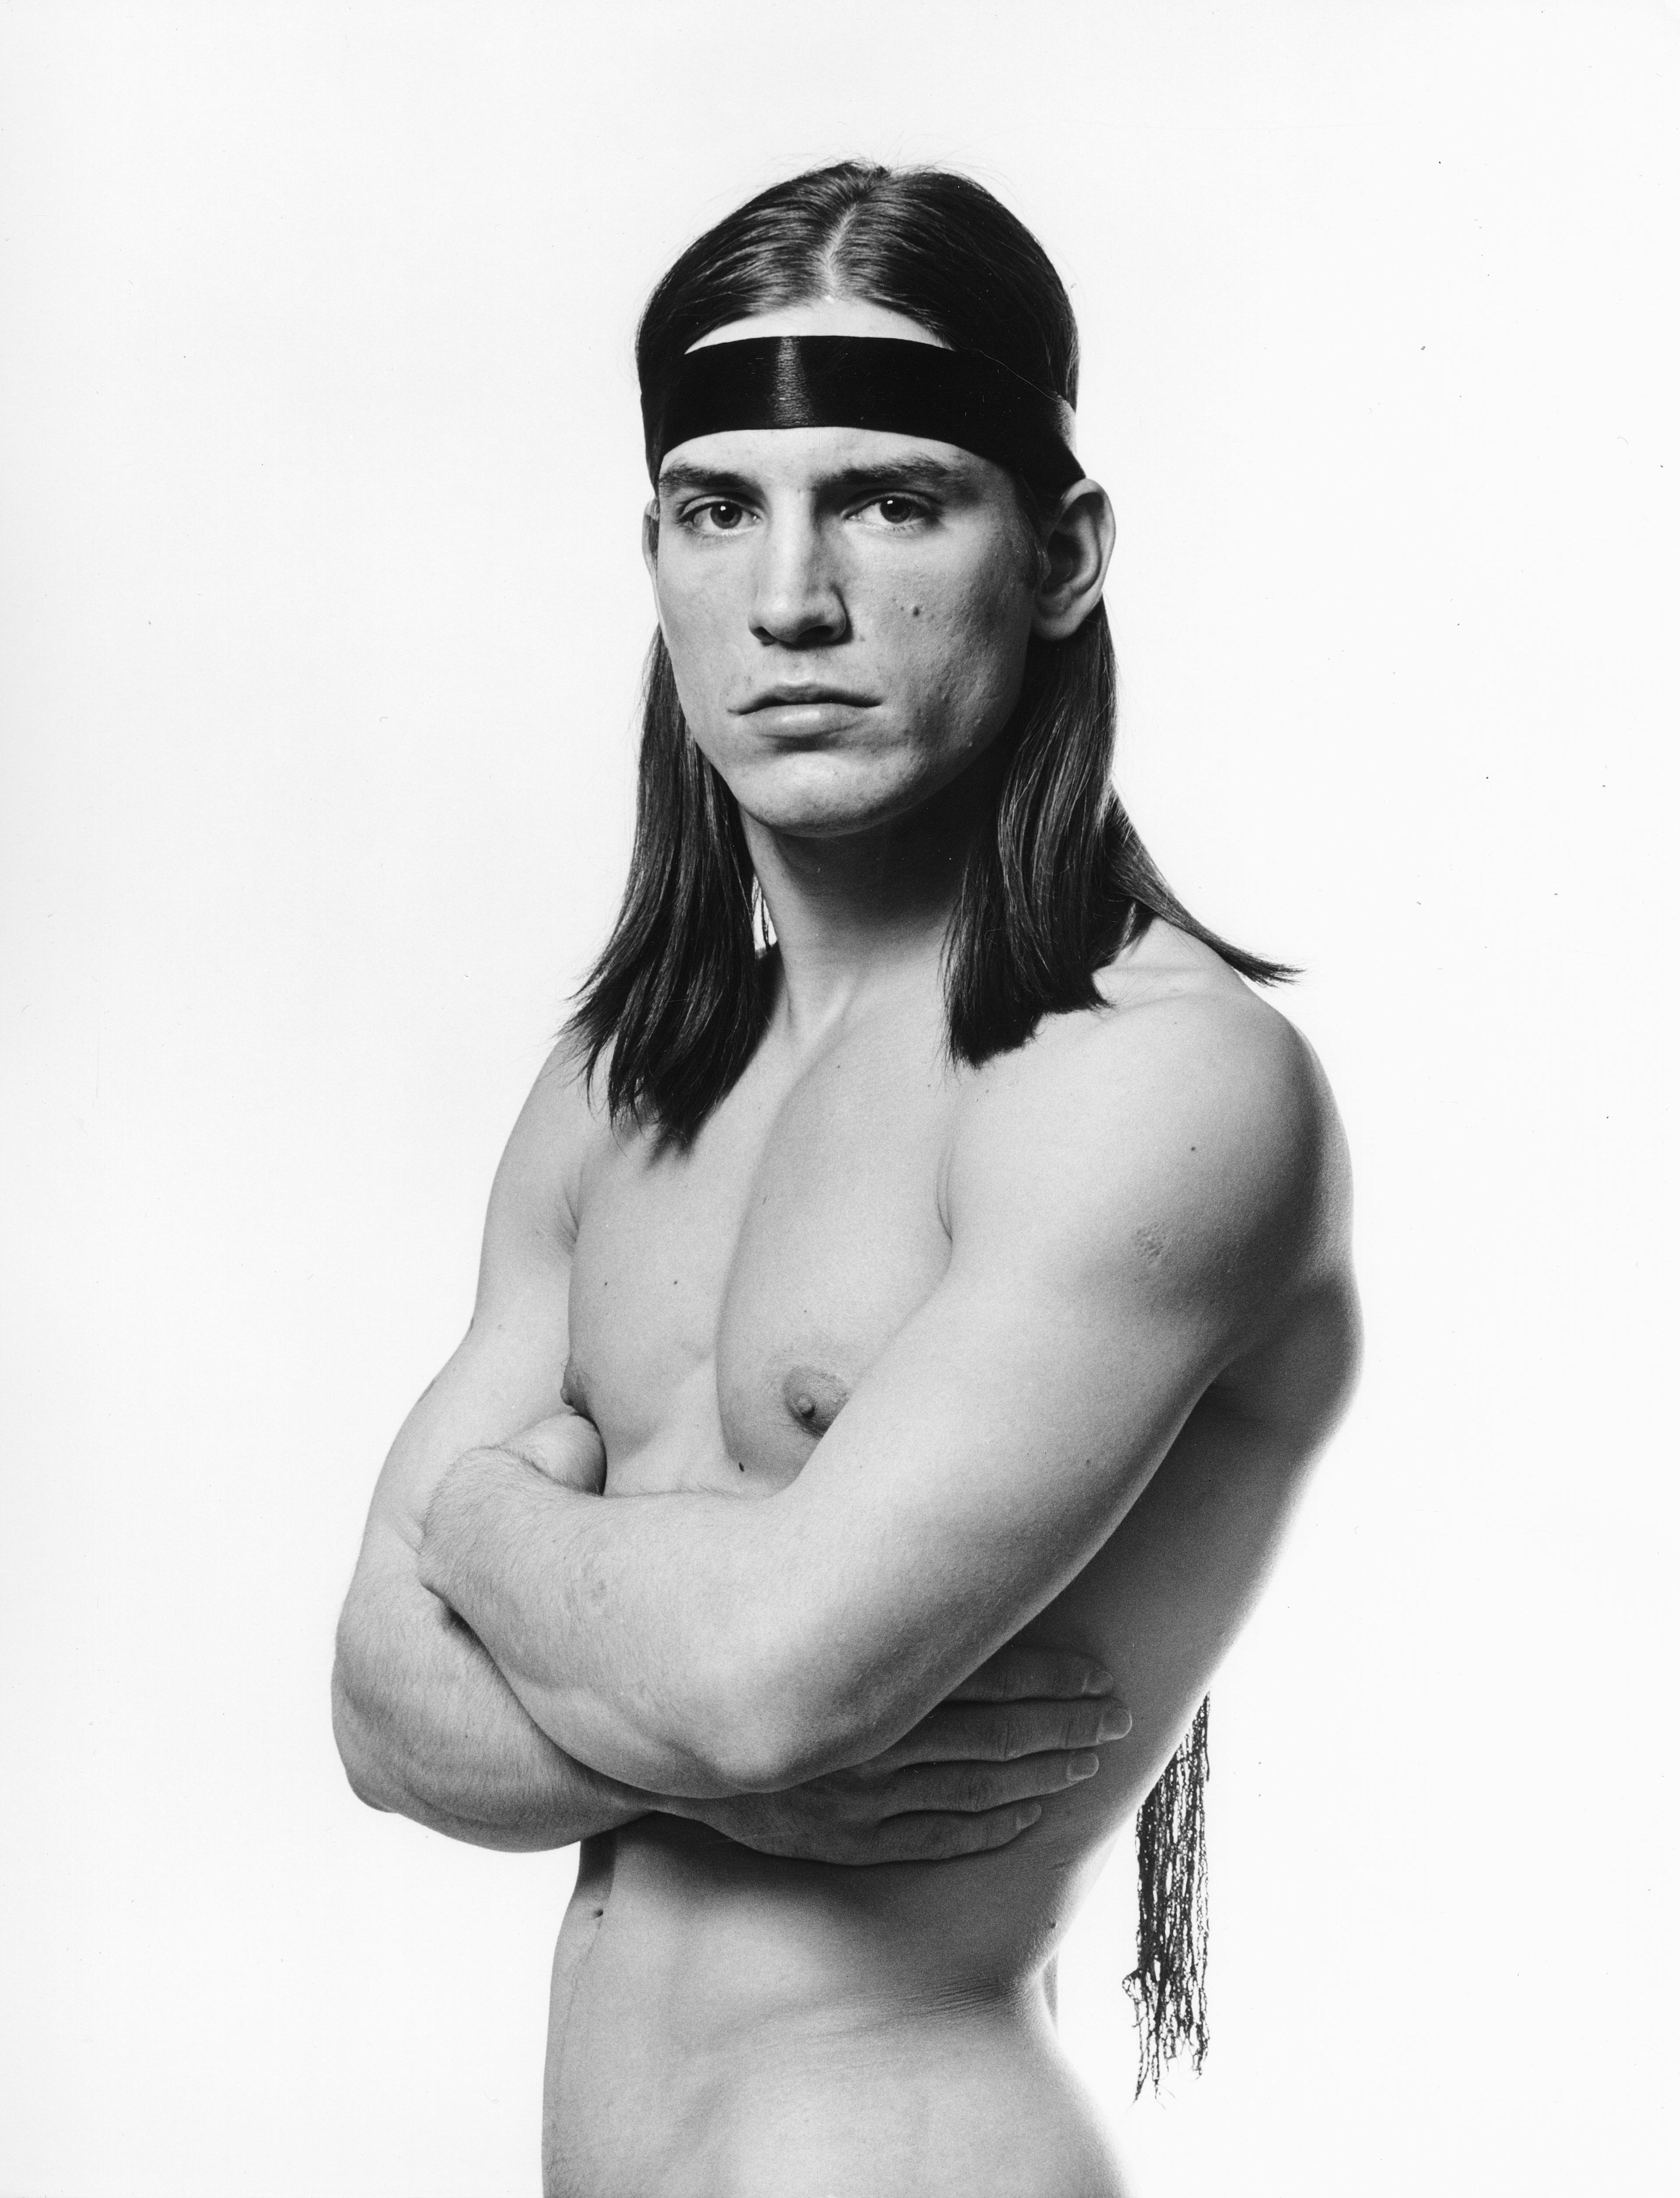 Warhol 'Trash' Superstar Joe Dallesandro, Iconic Movie Poster Photograph